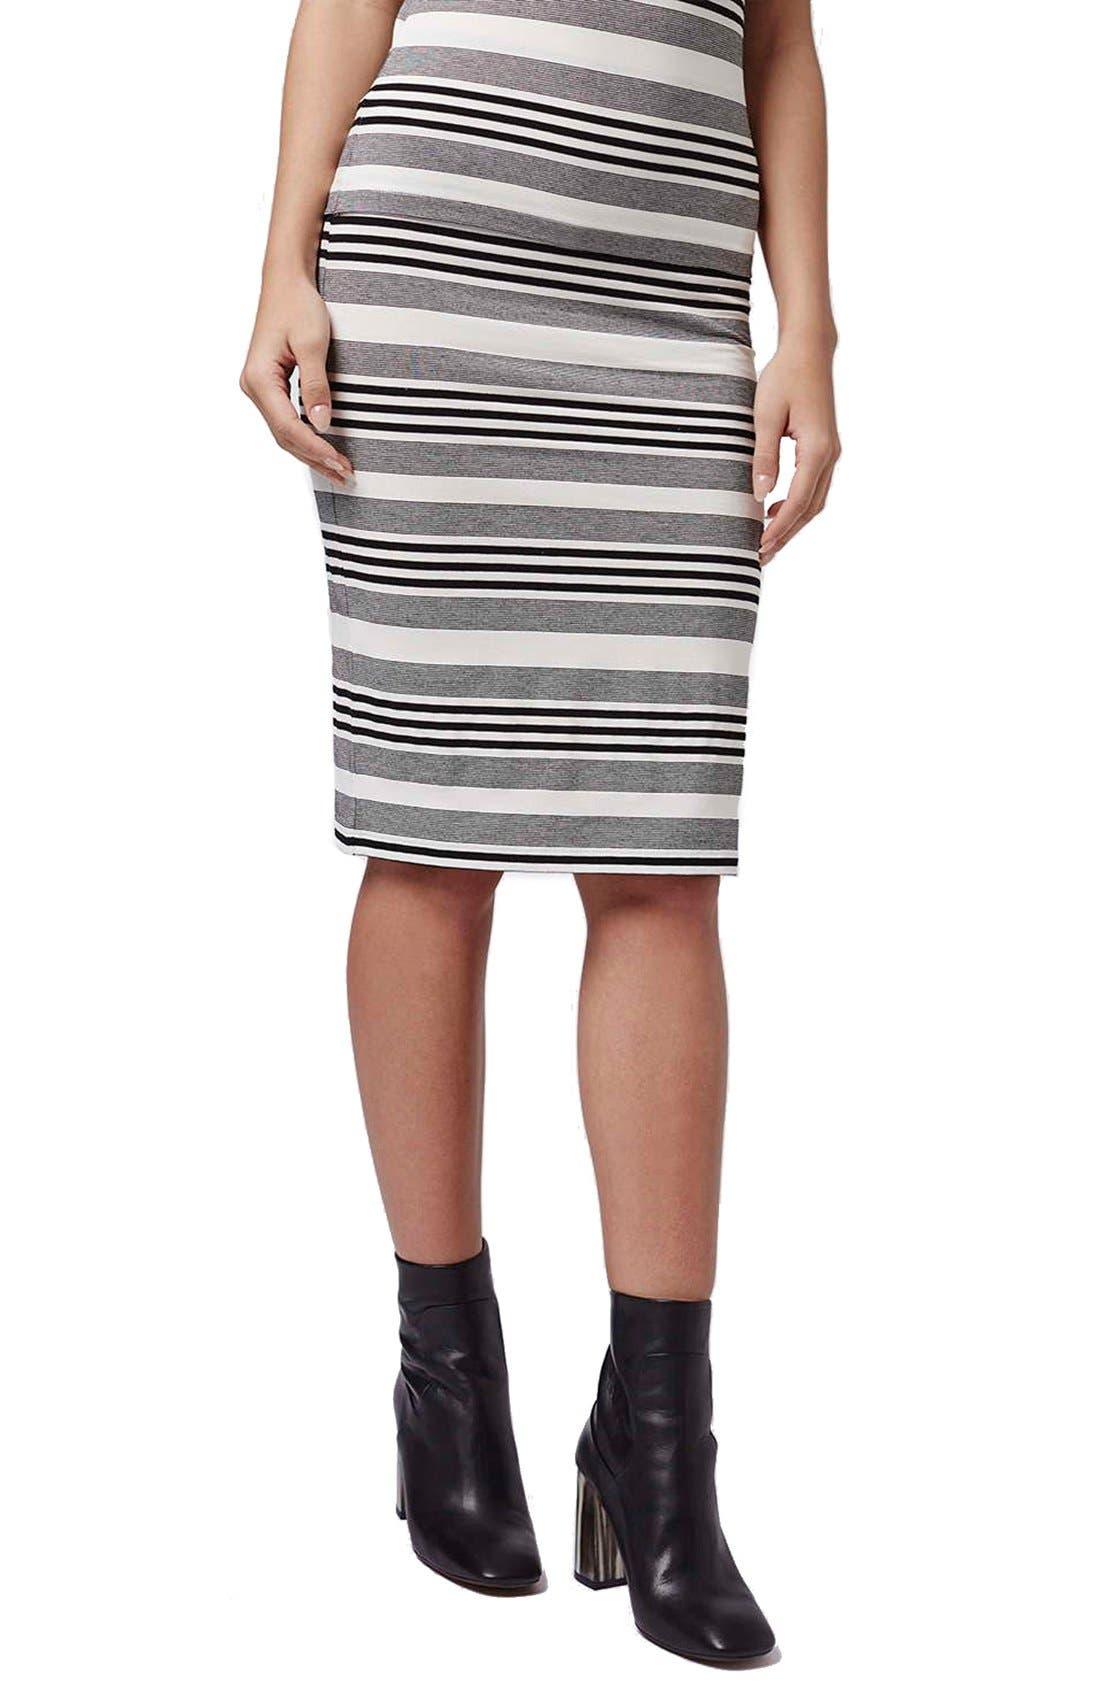 Alternate Image 1 Selected - Topshop Stripe Jersey Tube Skirt (Petite)